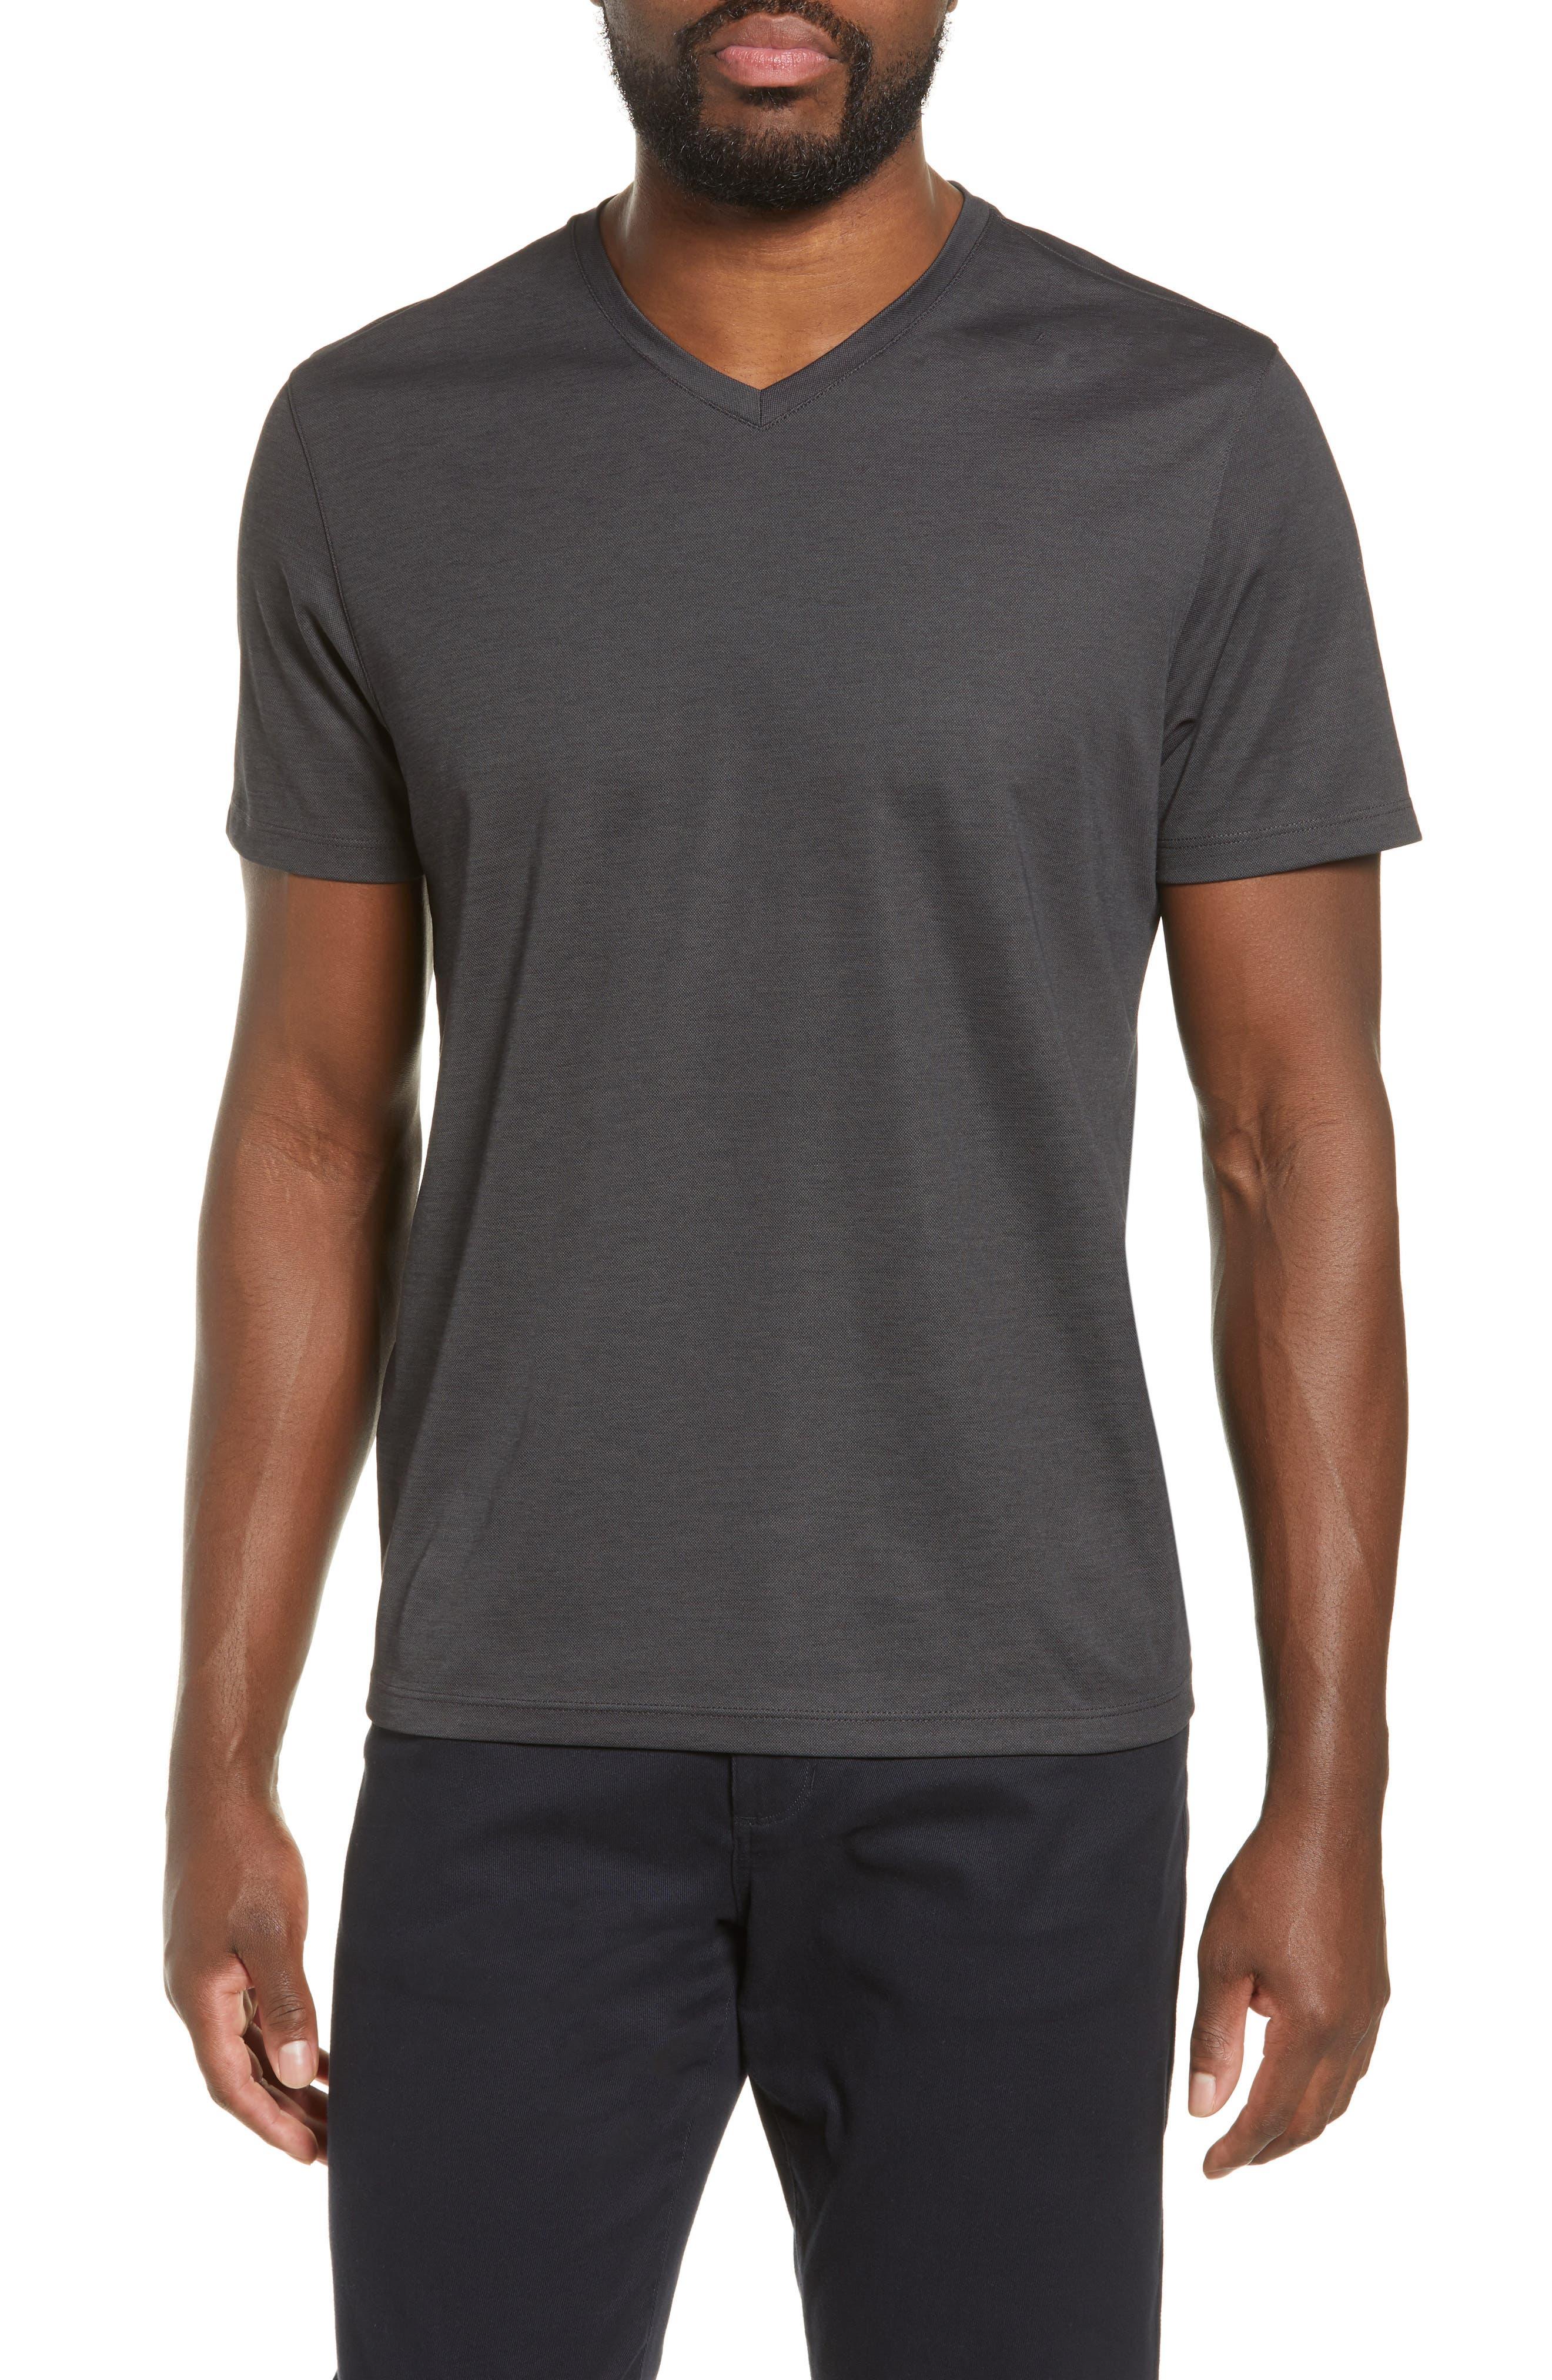 ZACHARY PRELL Brookville Regular Fit Piqué T-Shirt, Main, color, BLACK